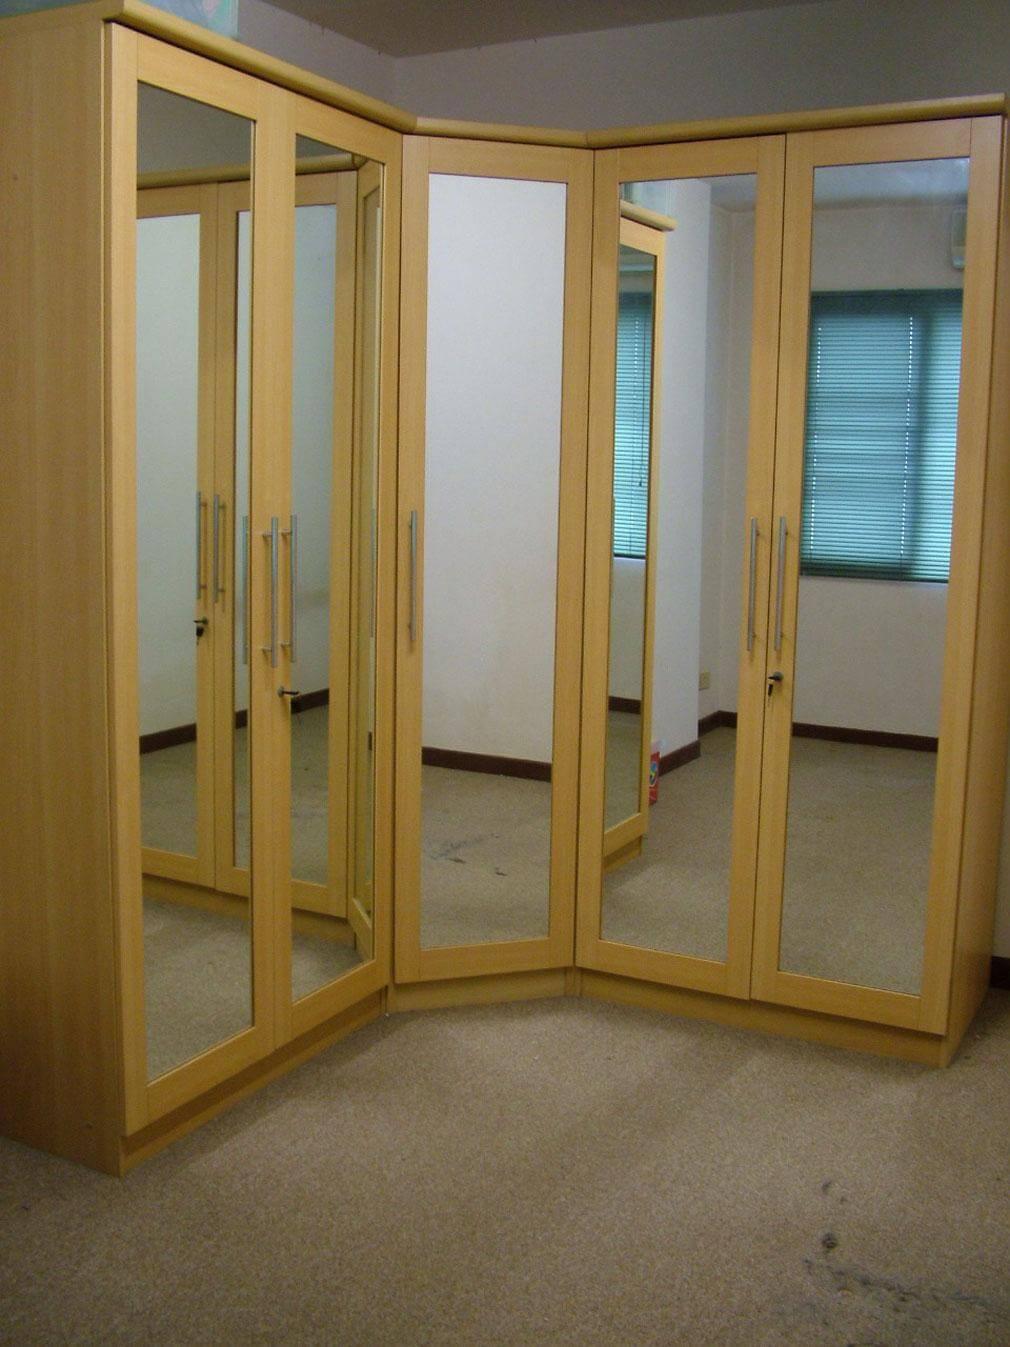 mirrored closet doors frameless photo - 1